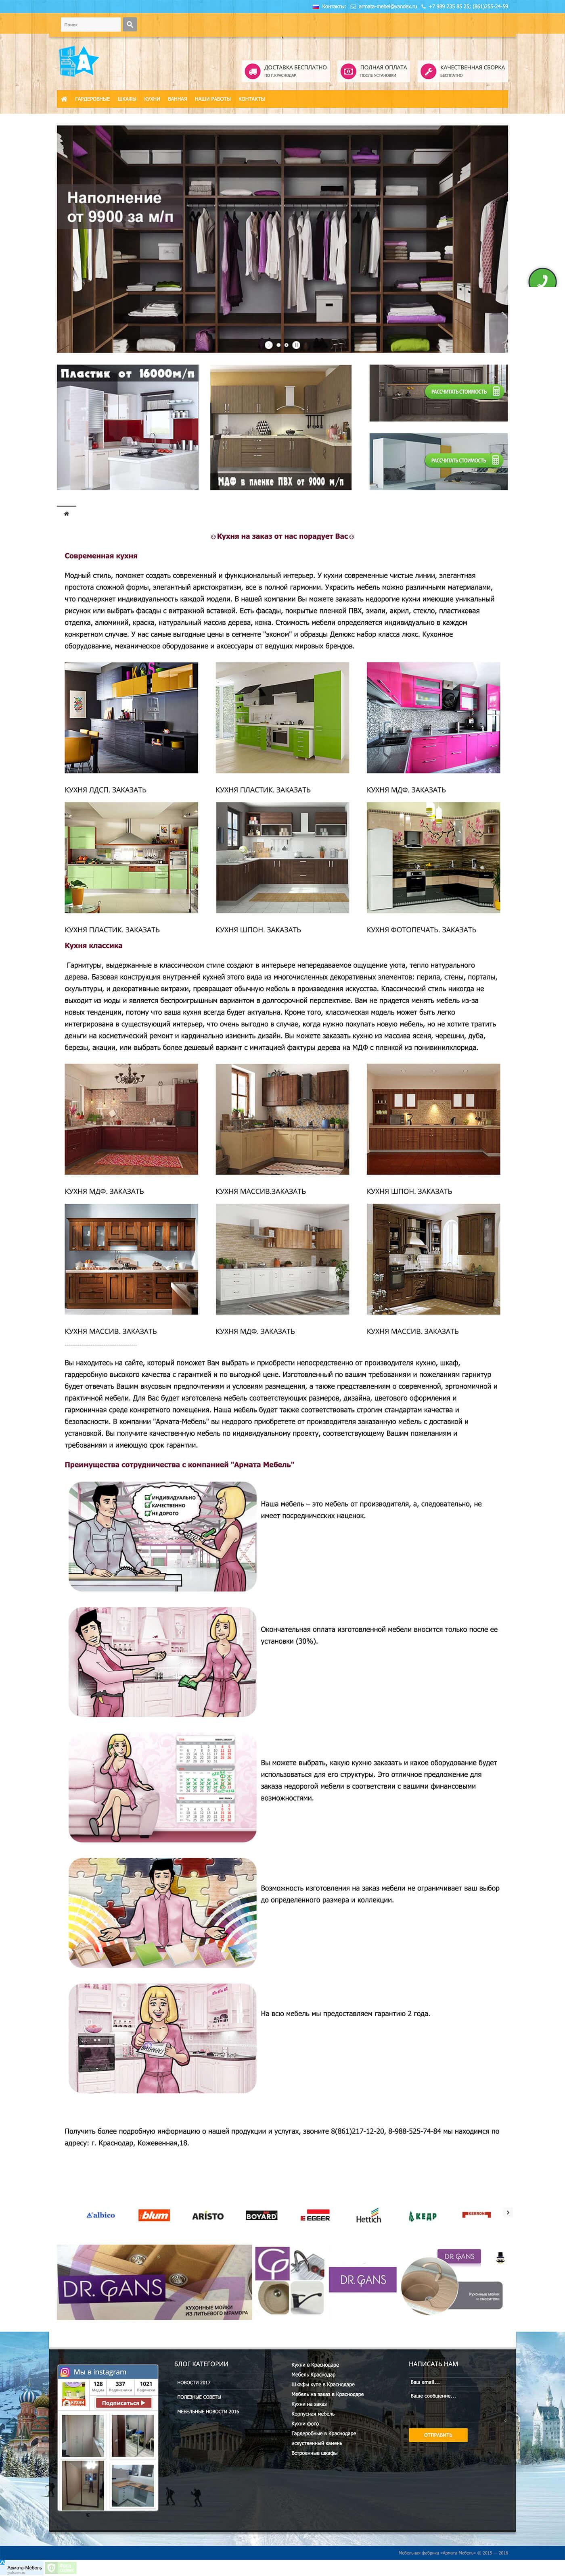 Сайт мебельной компании Армата